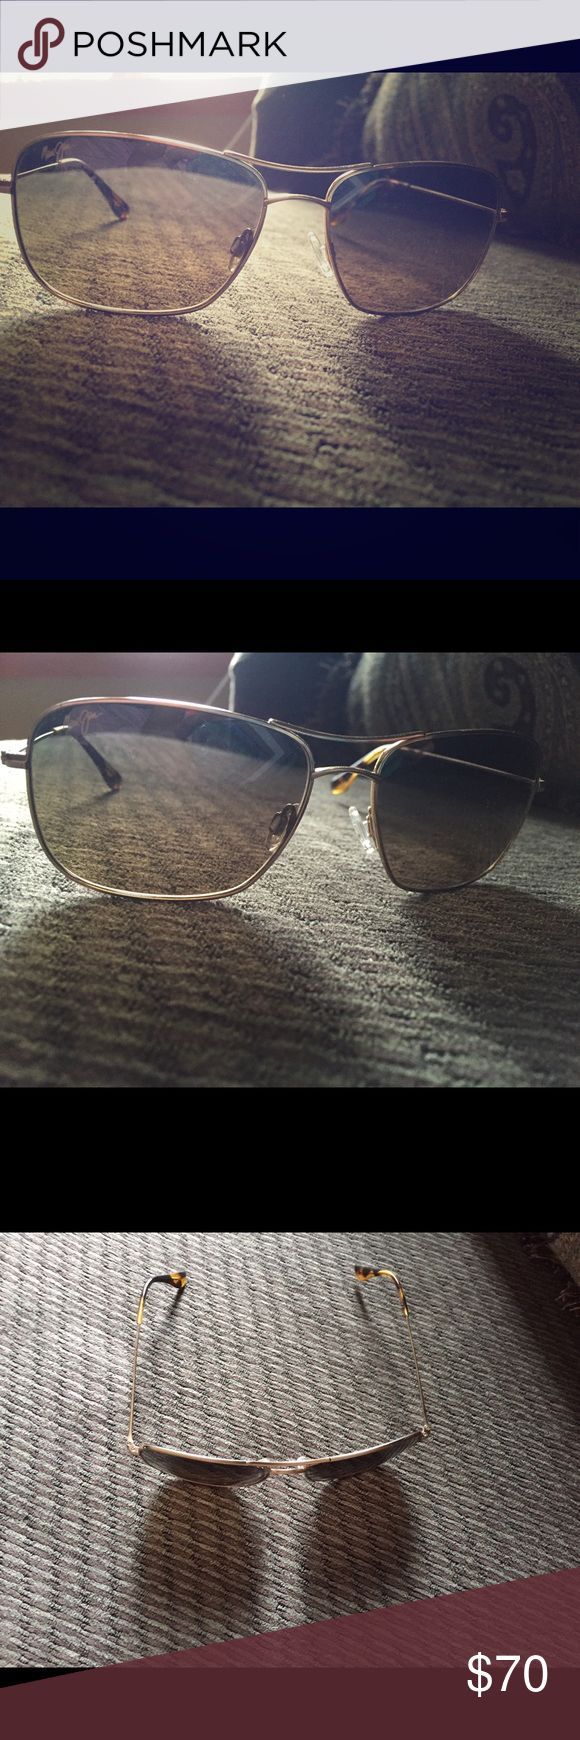 Maui Jim Sport Sunglasses Maui Jim Sunglasses- sport style- brown tint Maui Jim Accessories Sunglasses